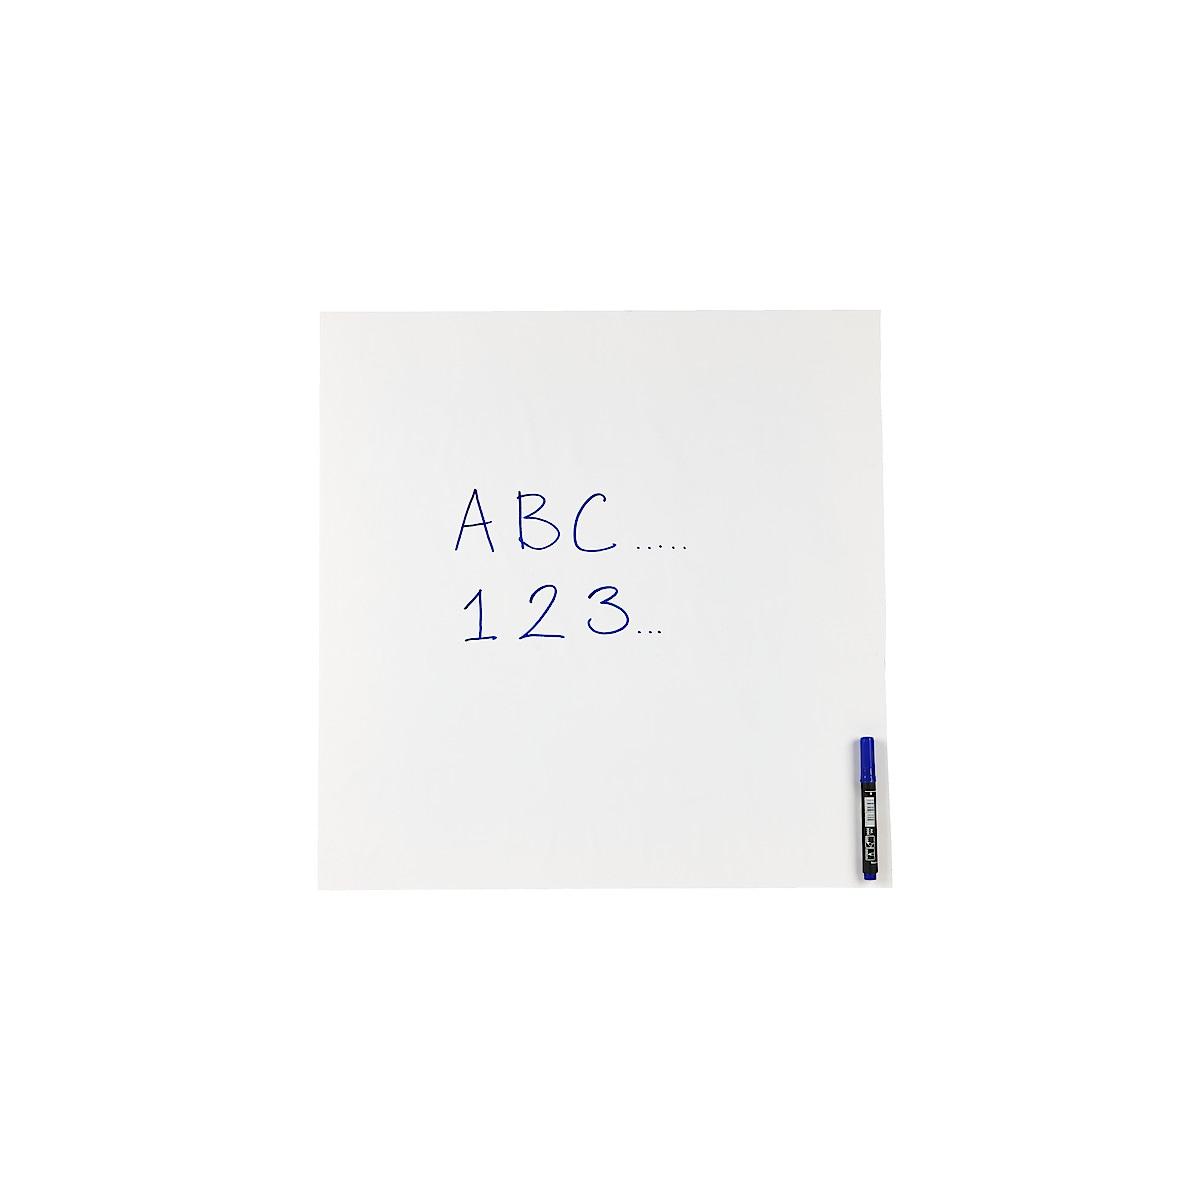 Självhäftande whiteboardfilm 60 x 80 cm